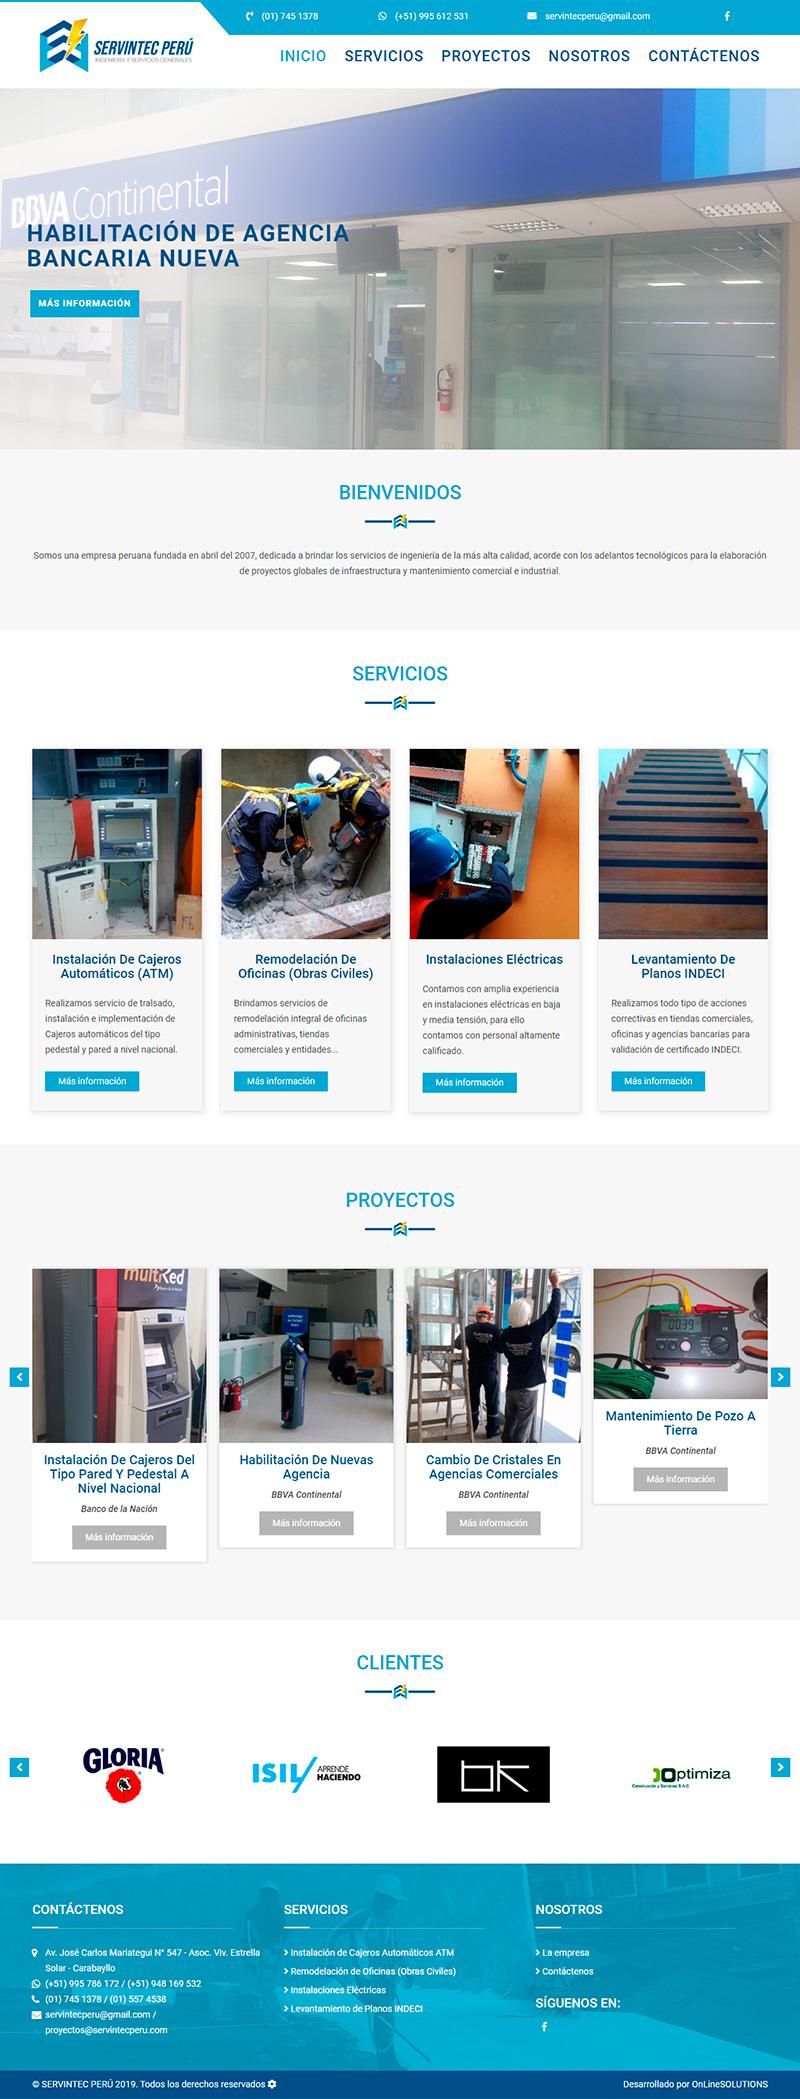 SERVINTEC PERU - Página web